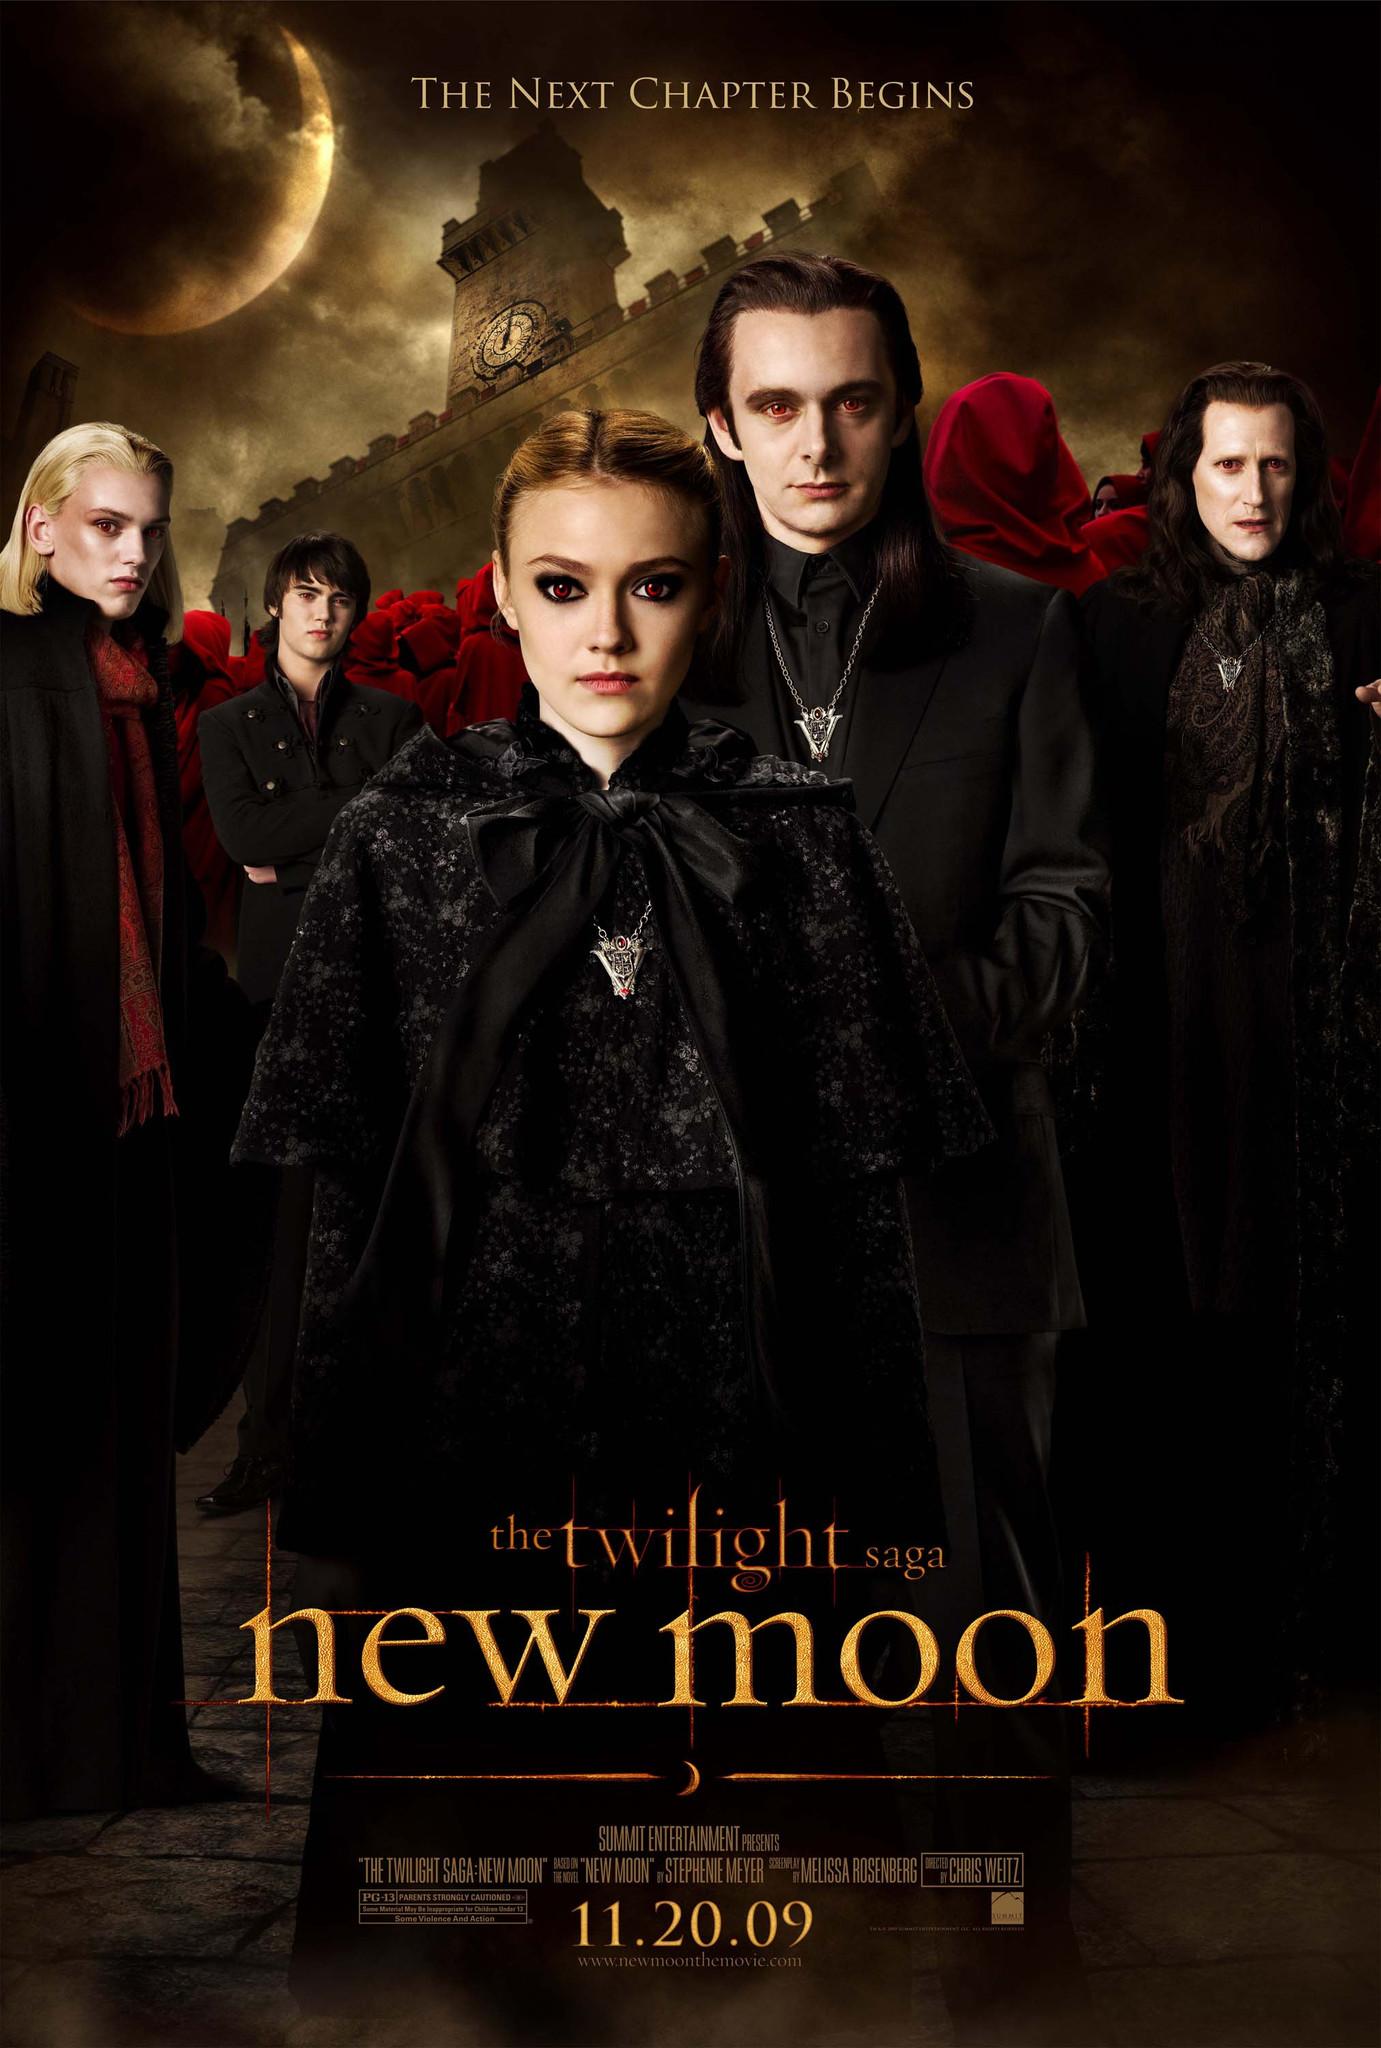 the twilight saga new moon 2009 dual audio movie free download